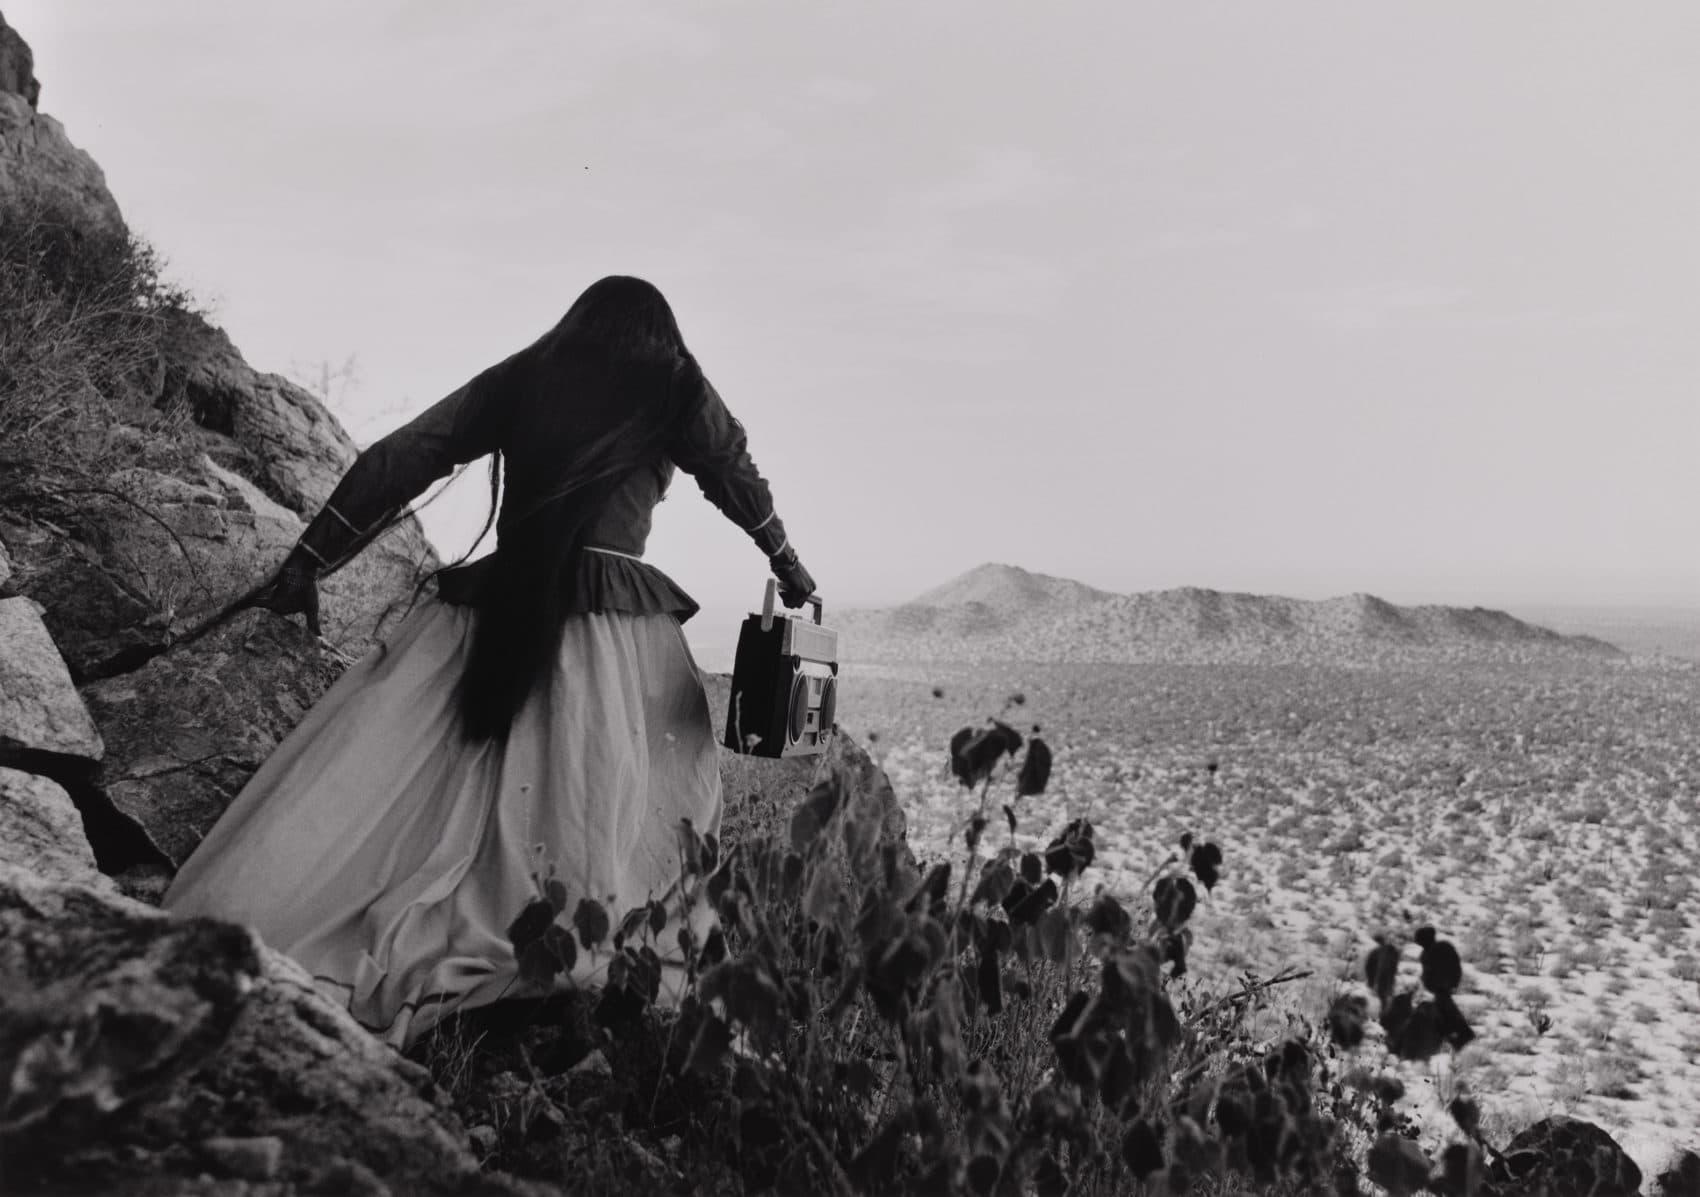 Graciela iturbides black and white photos wrestle with